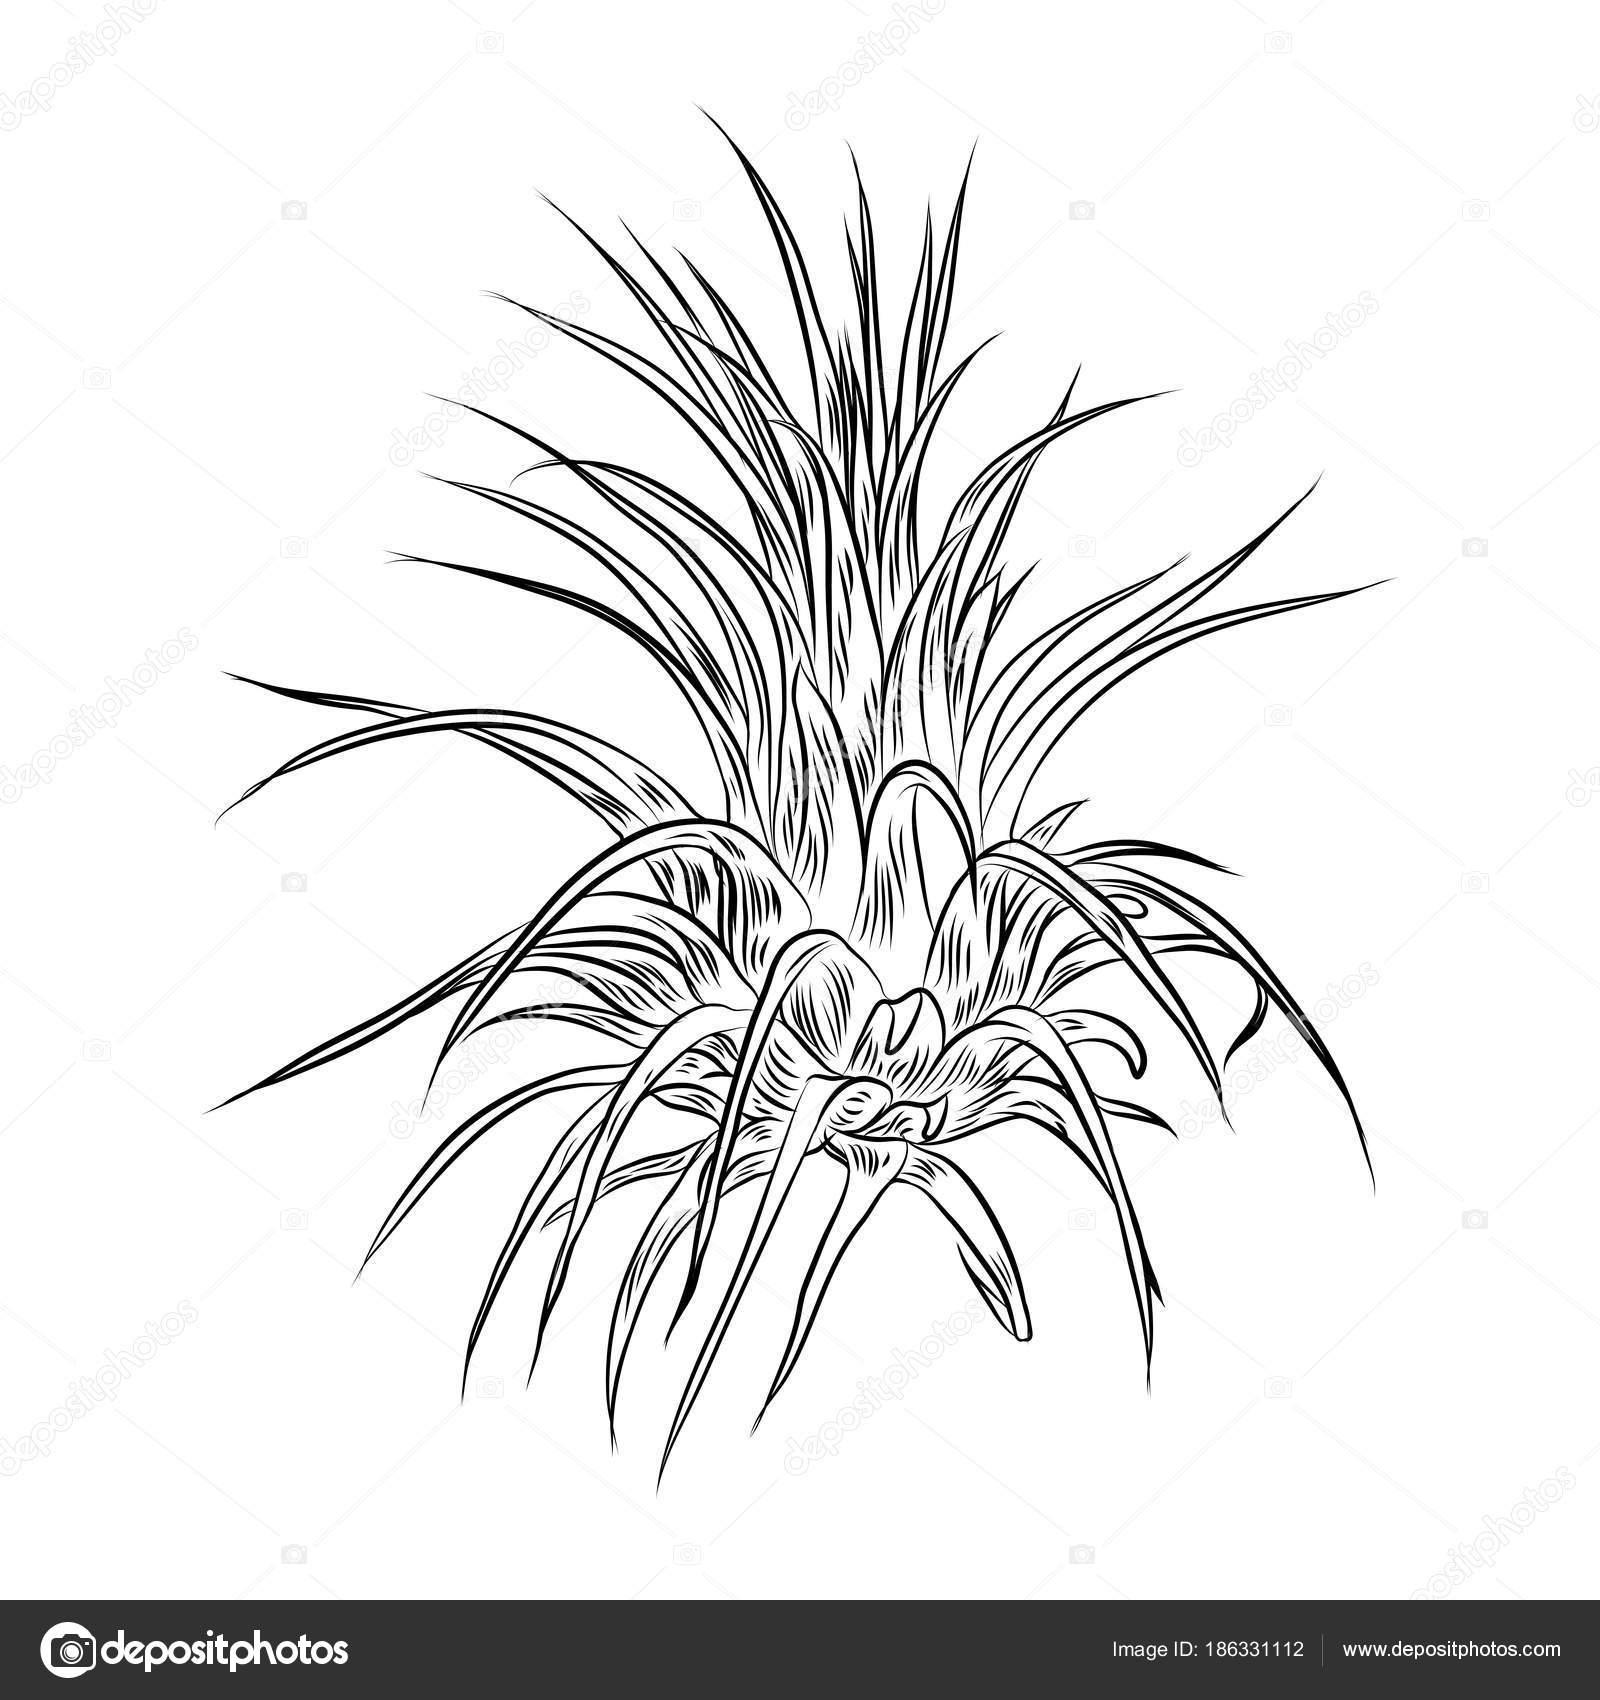 Air Plant Tillandsias Cactus Fashion Design Cacti Mood Sketchy Hand Vector Image By C Goldenshrimp Vector Stock 186331112